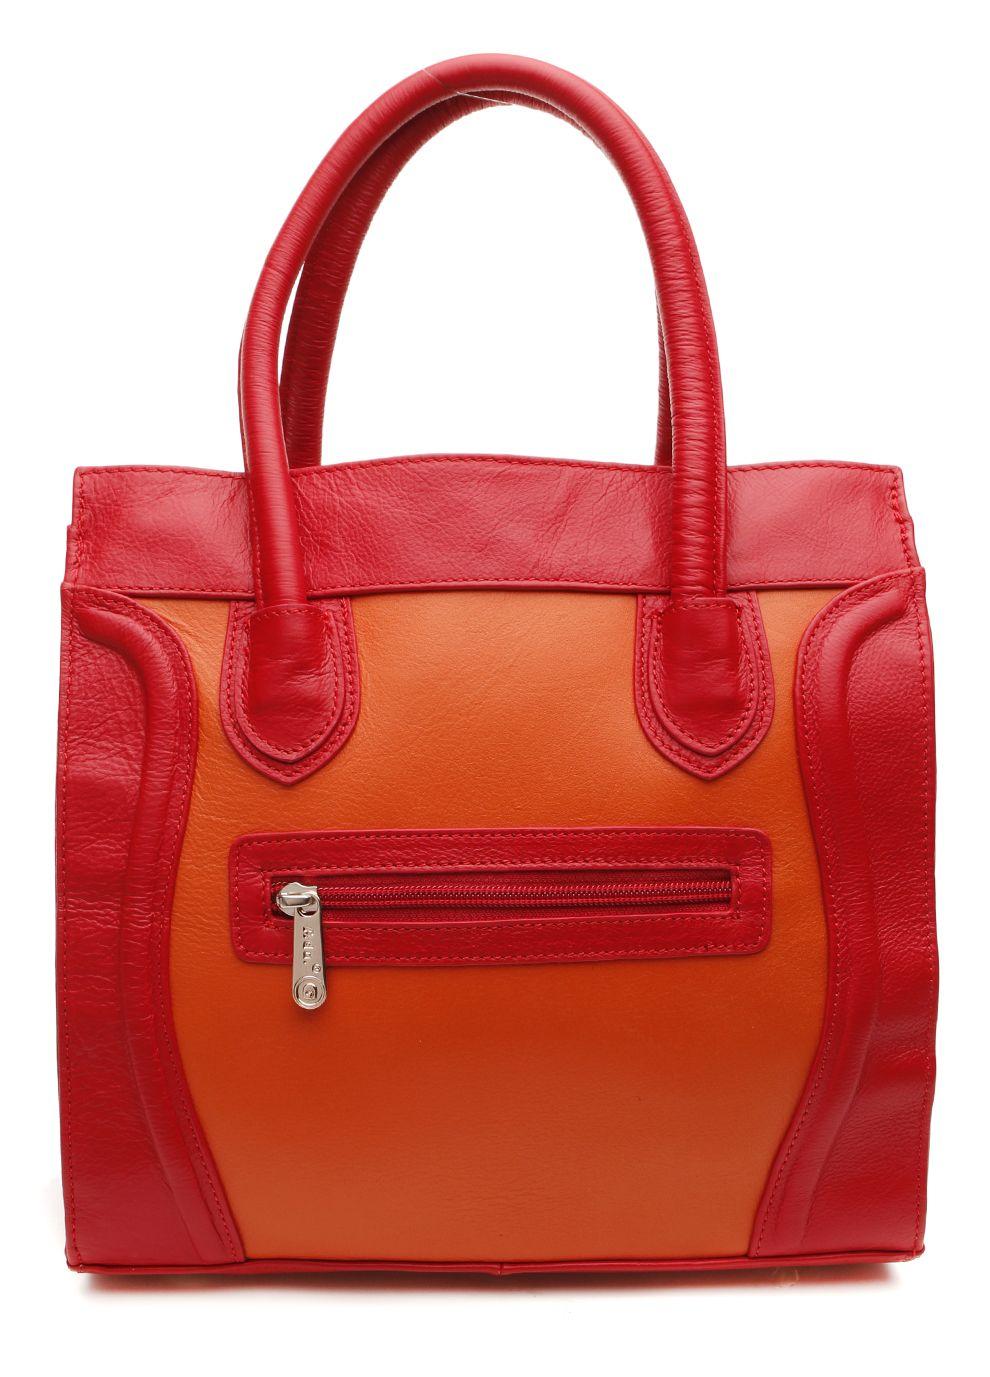 Ada G Handbags Leather Tote Bag Red Orange